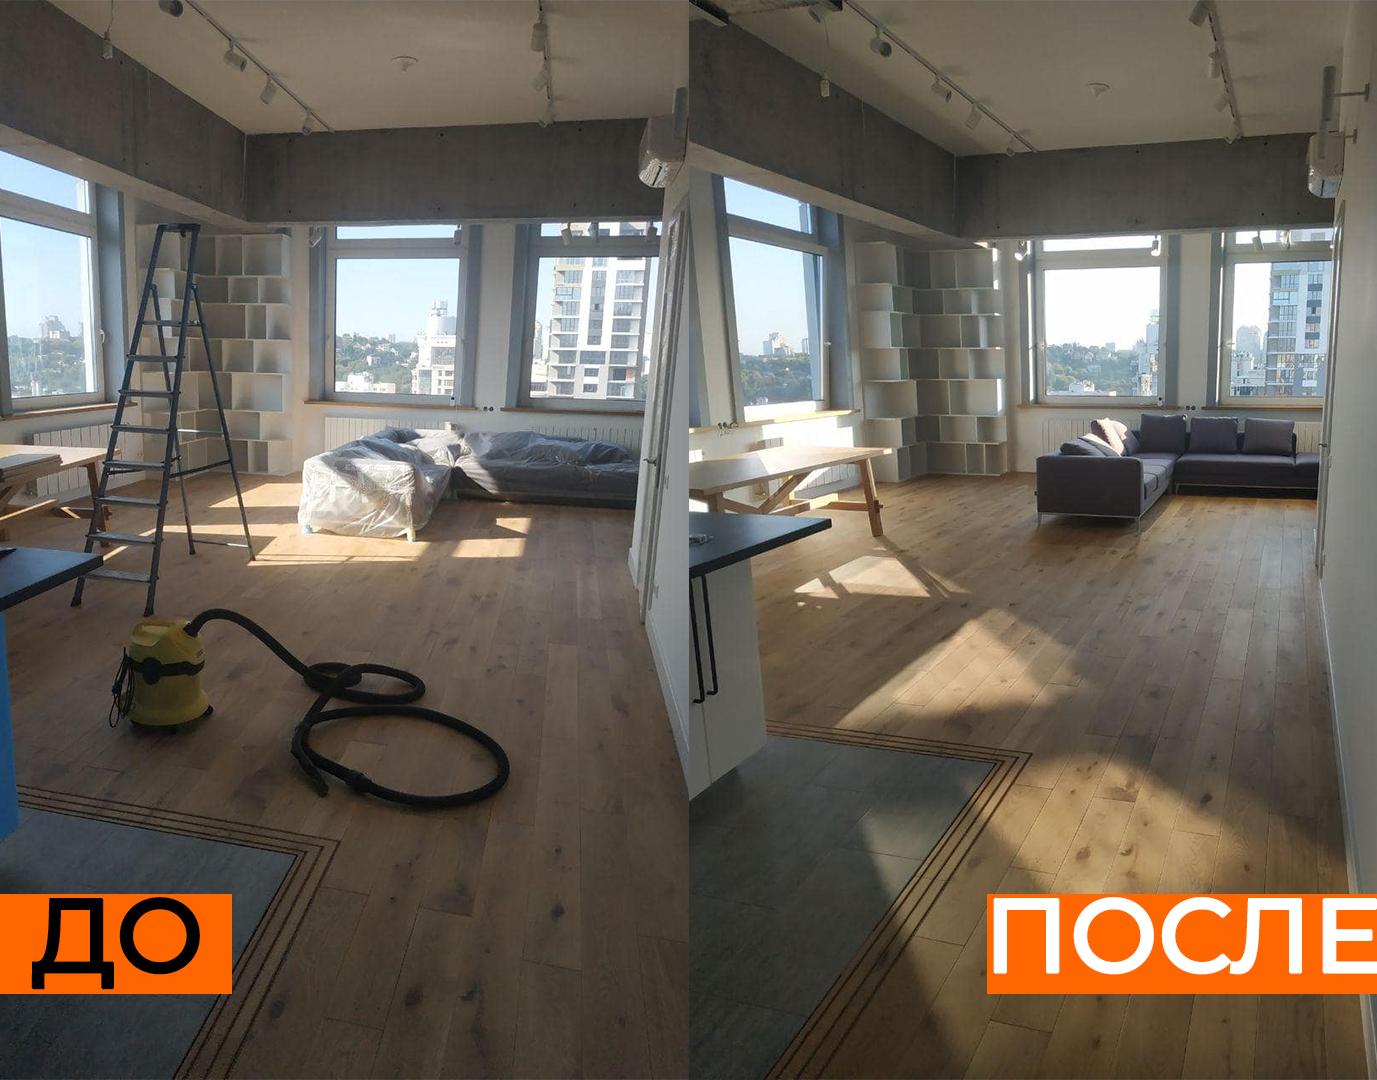 Фото Уборка квартиры после ремонта 1